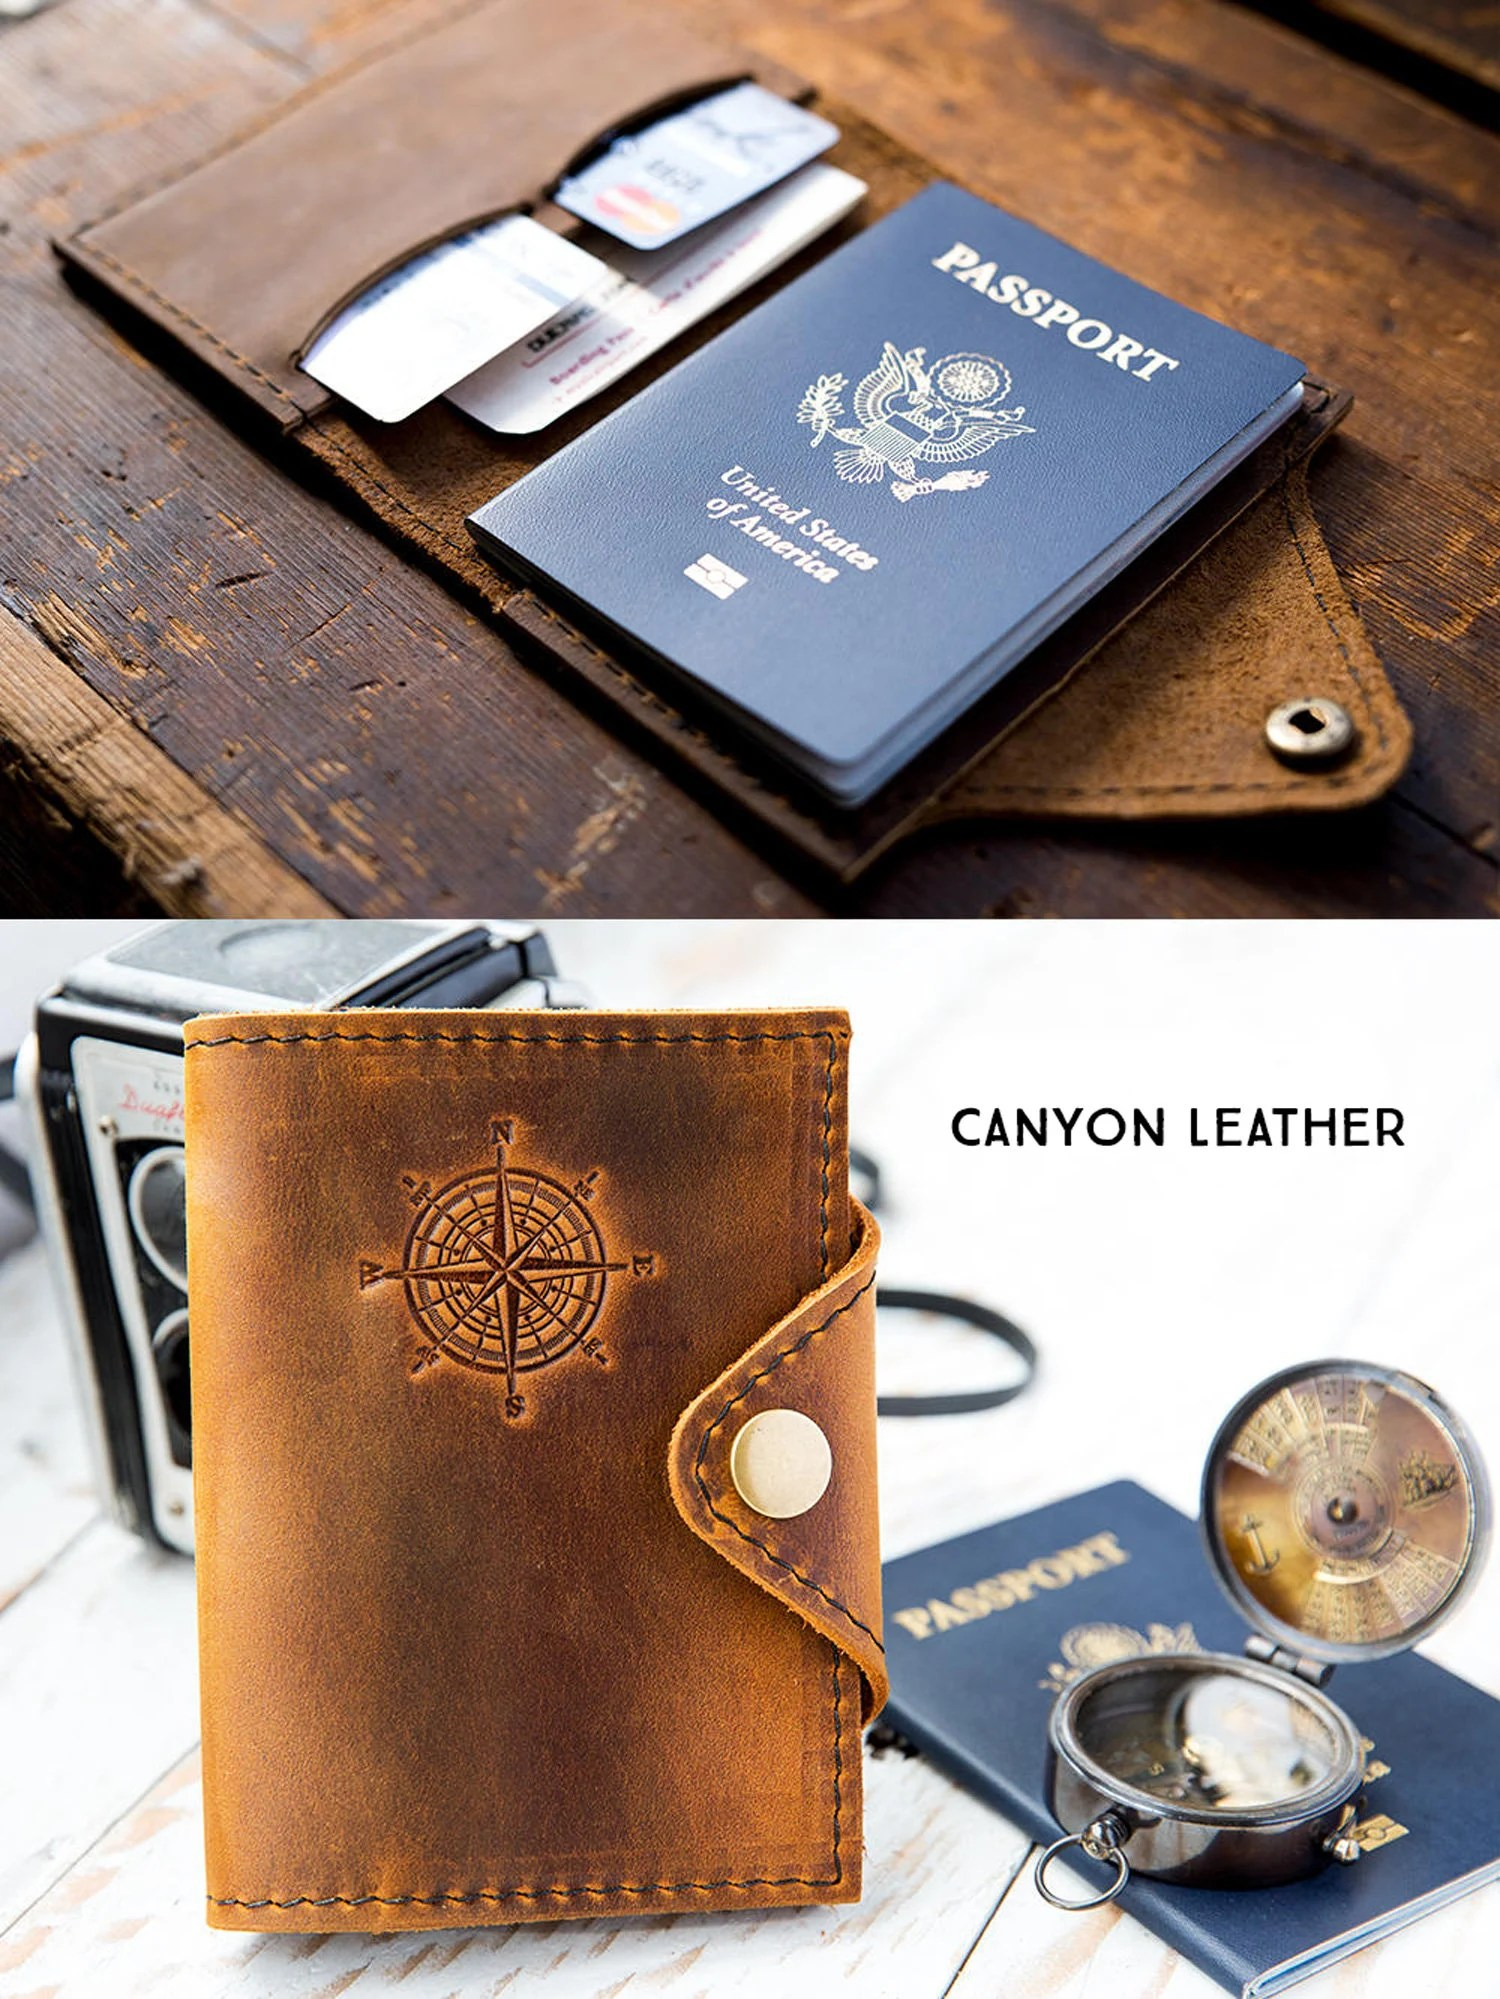 Passport Cover Travel Passport Personalized Cover... Custom image 4